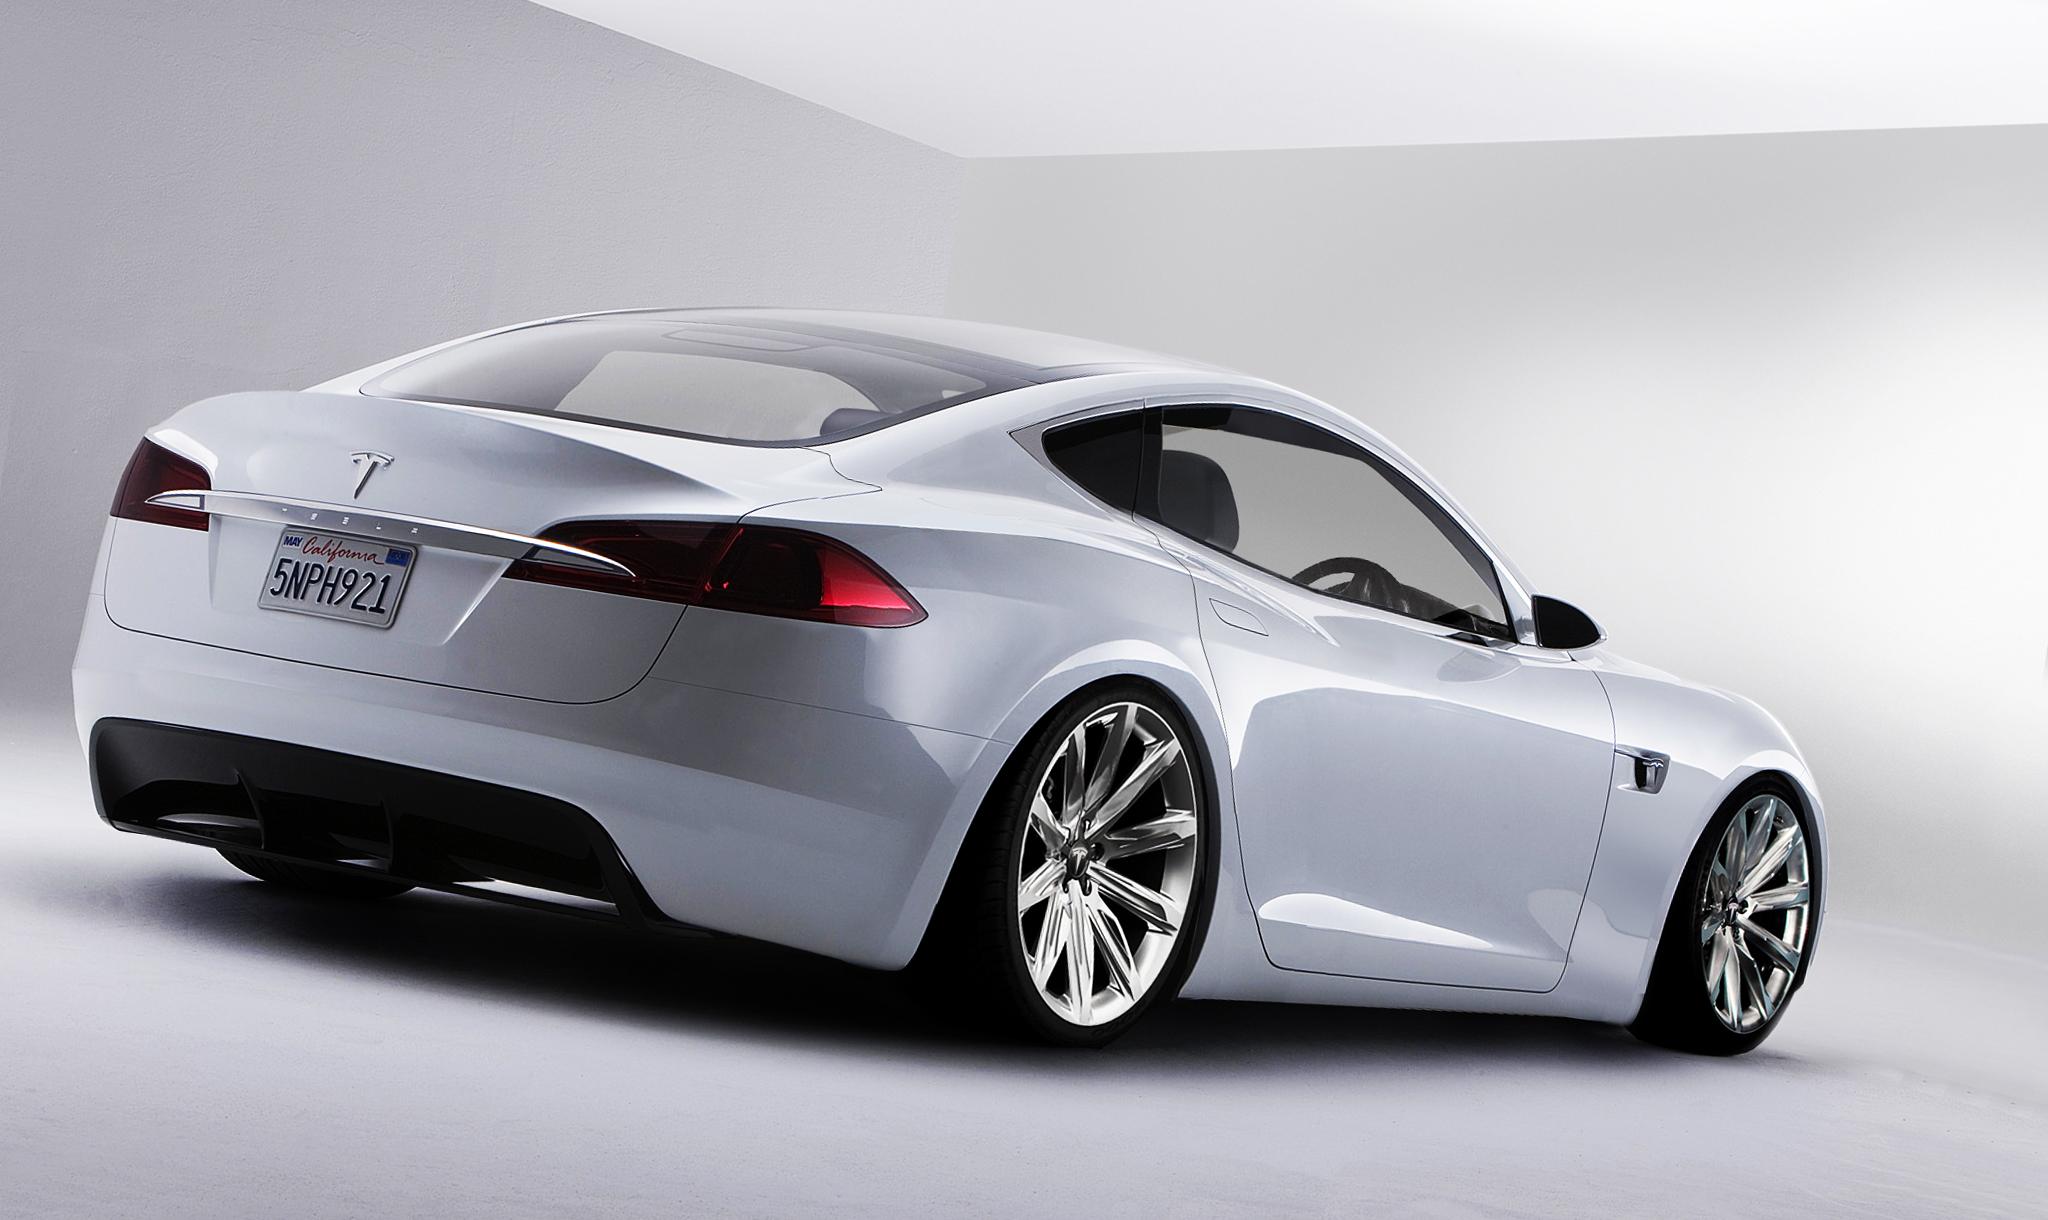 Tesla_coupe_S_concept_by_Kretiins.jpg